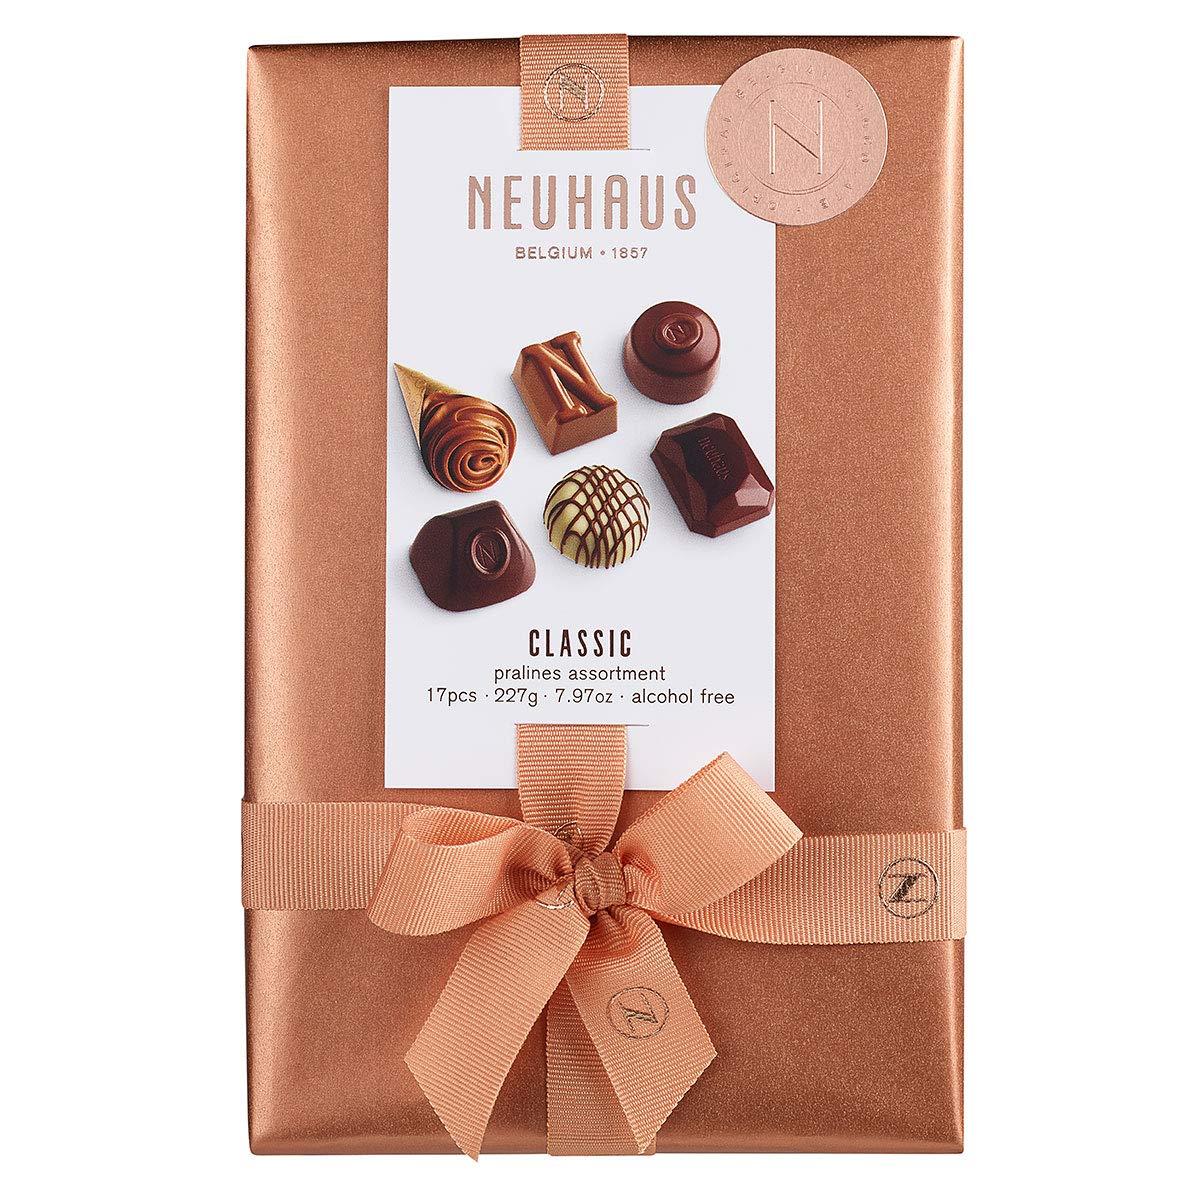 Neuhaus Belgian Chocolate Ballotin (17 pieces) - Gourmet Chocolate Gift Box - 1/2 lb by Neuhaus